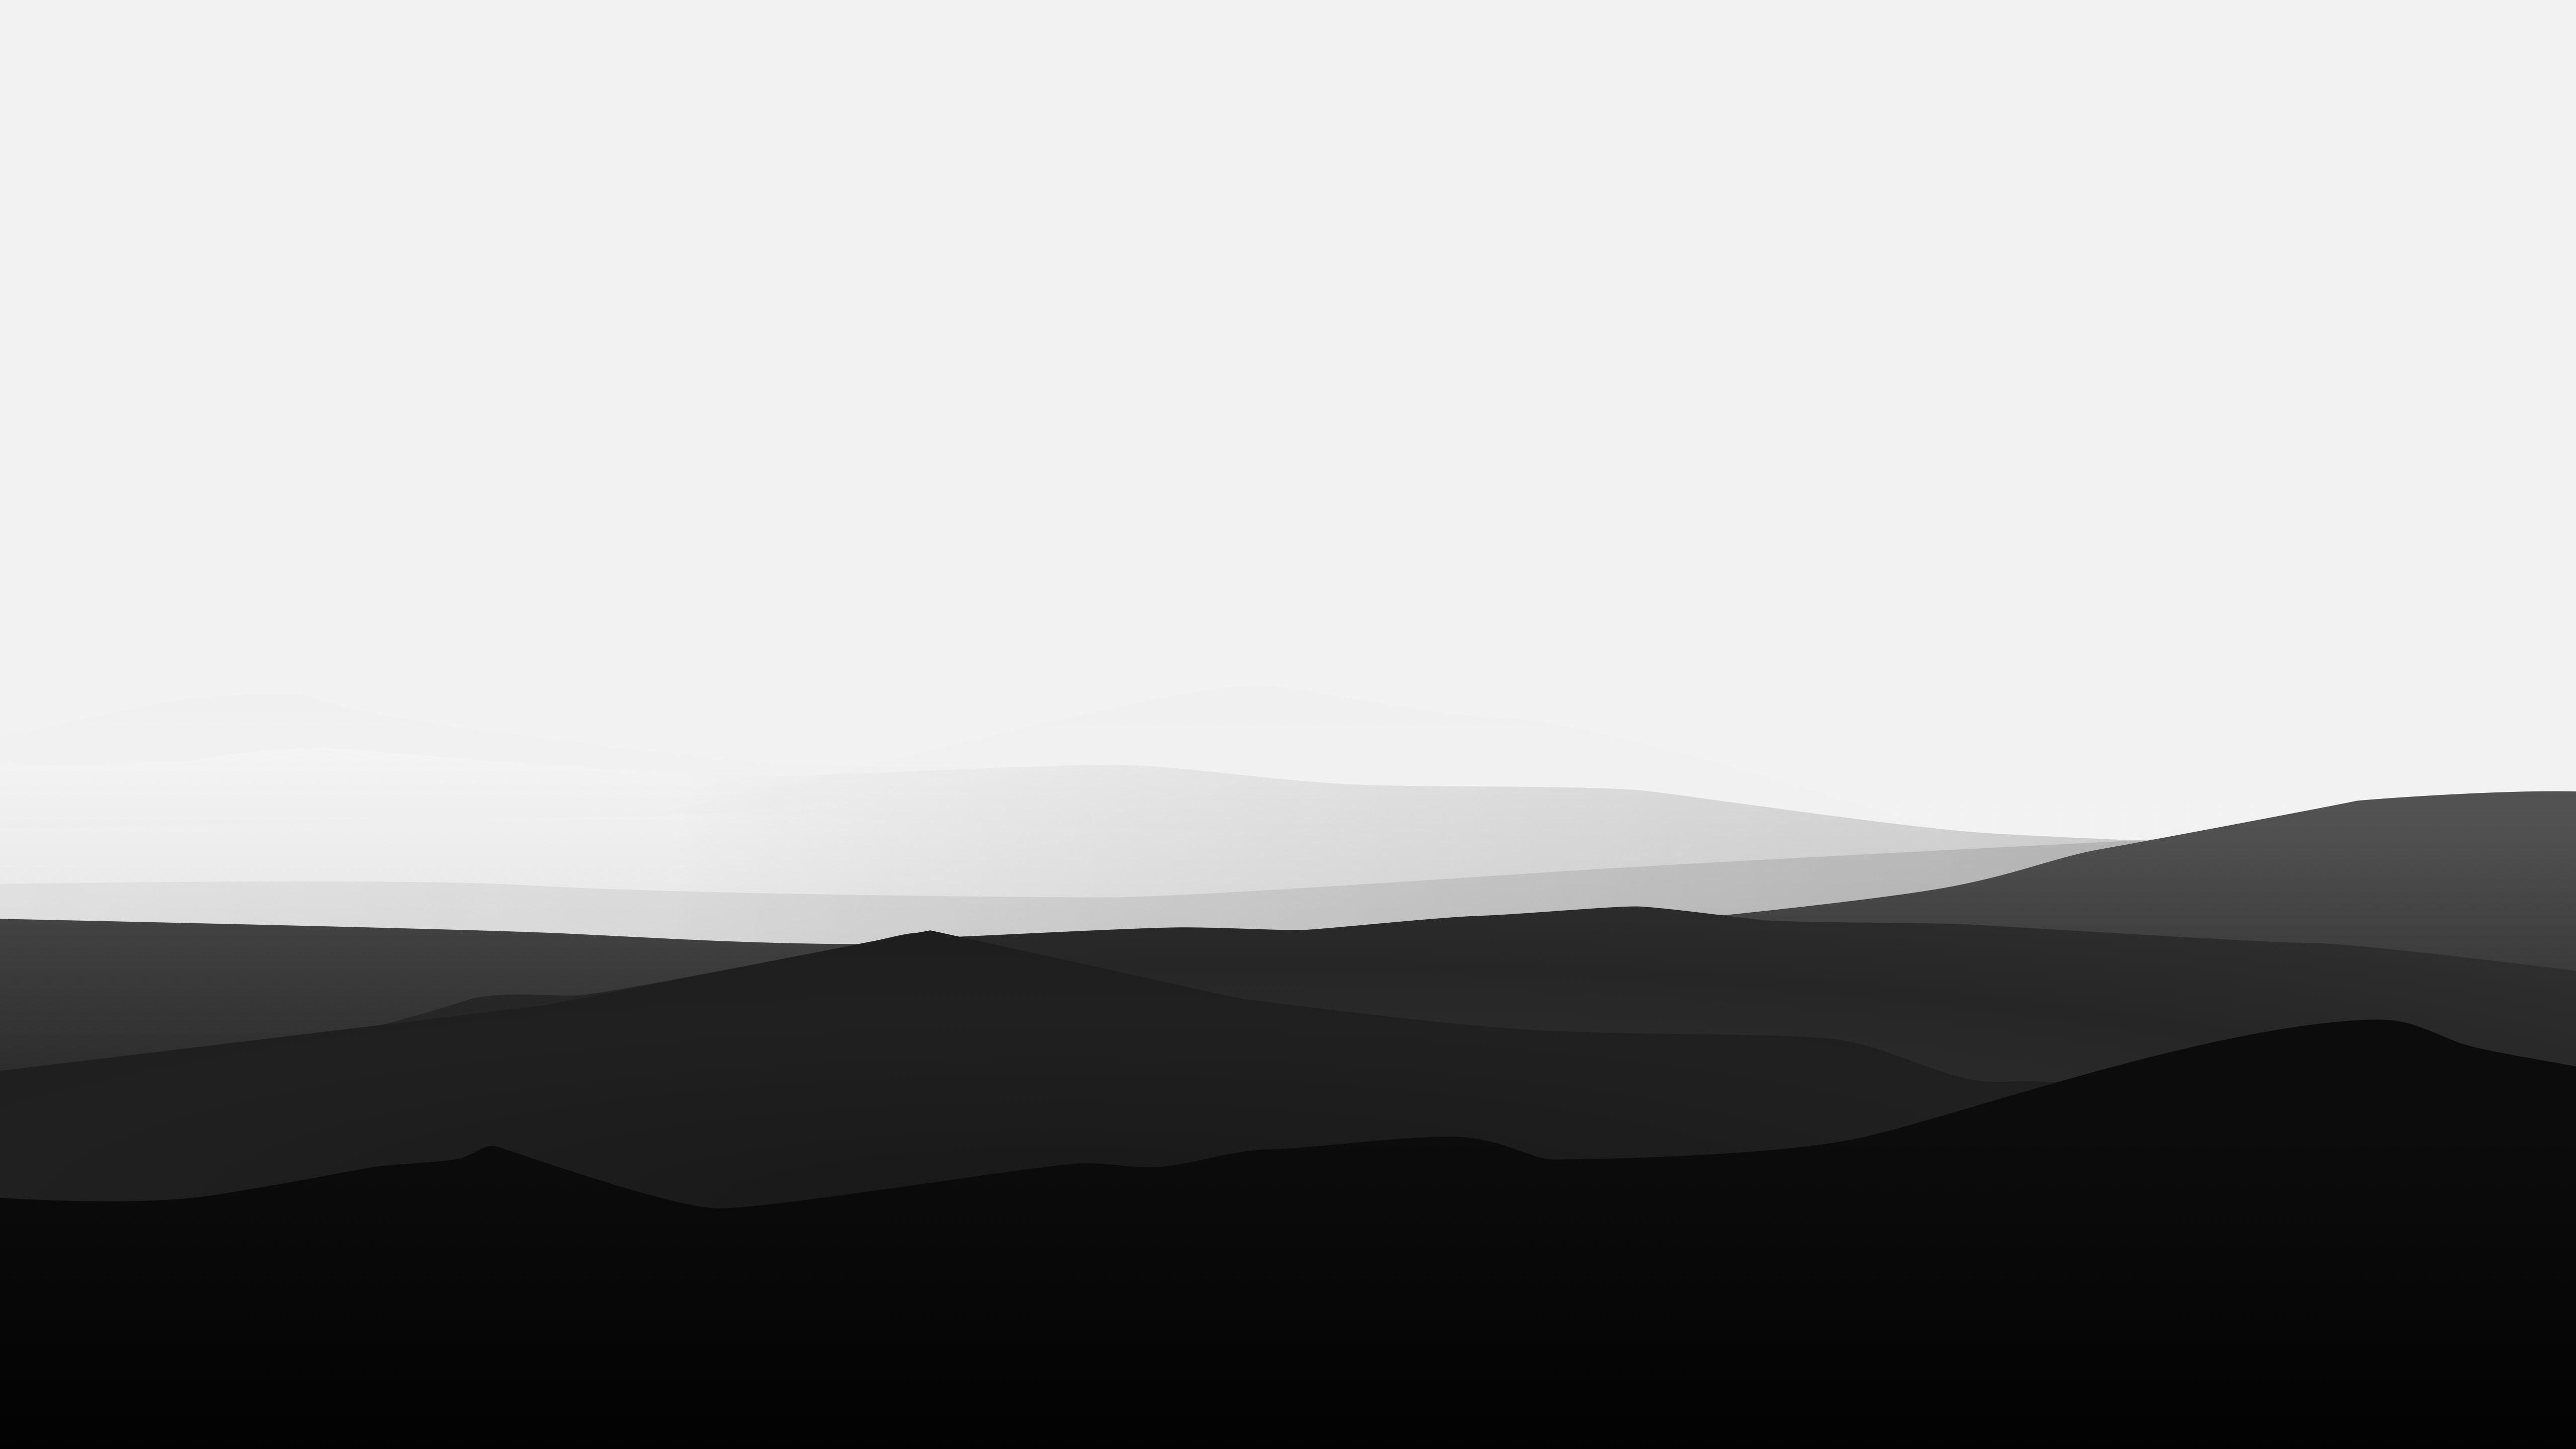 White Wallpaper Minimalist 5120x2880